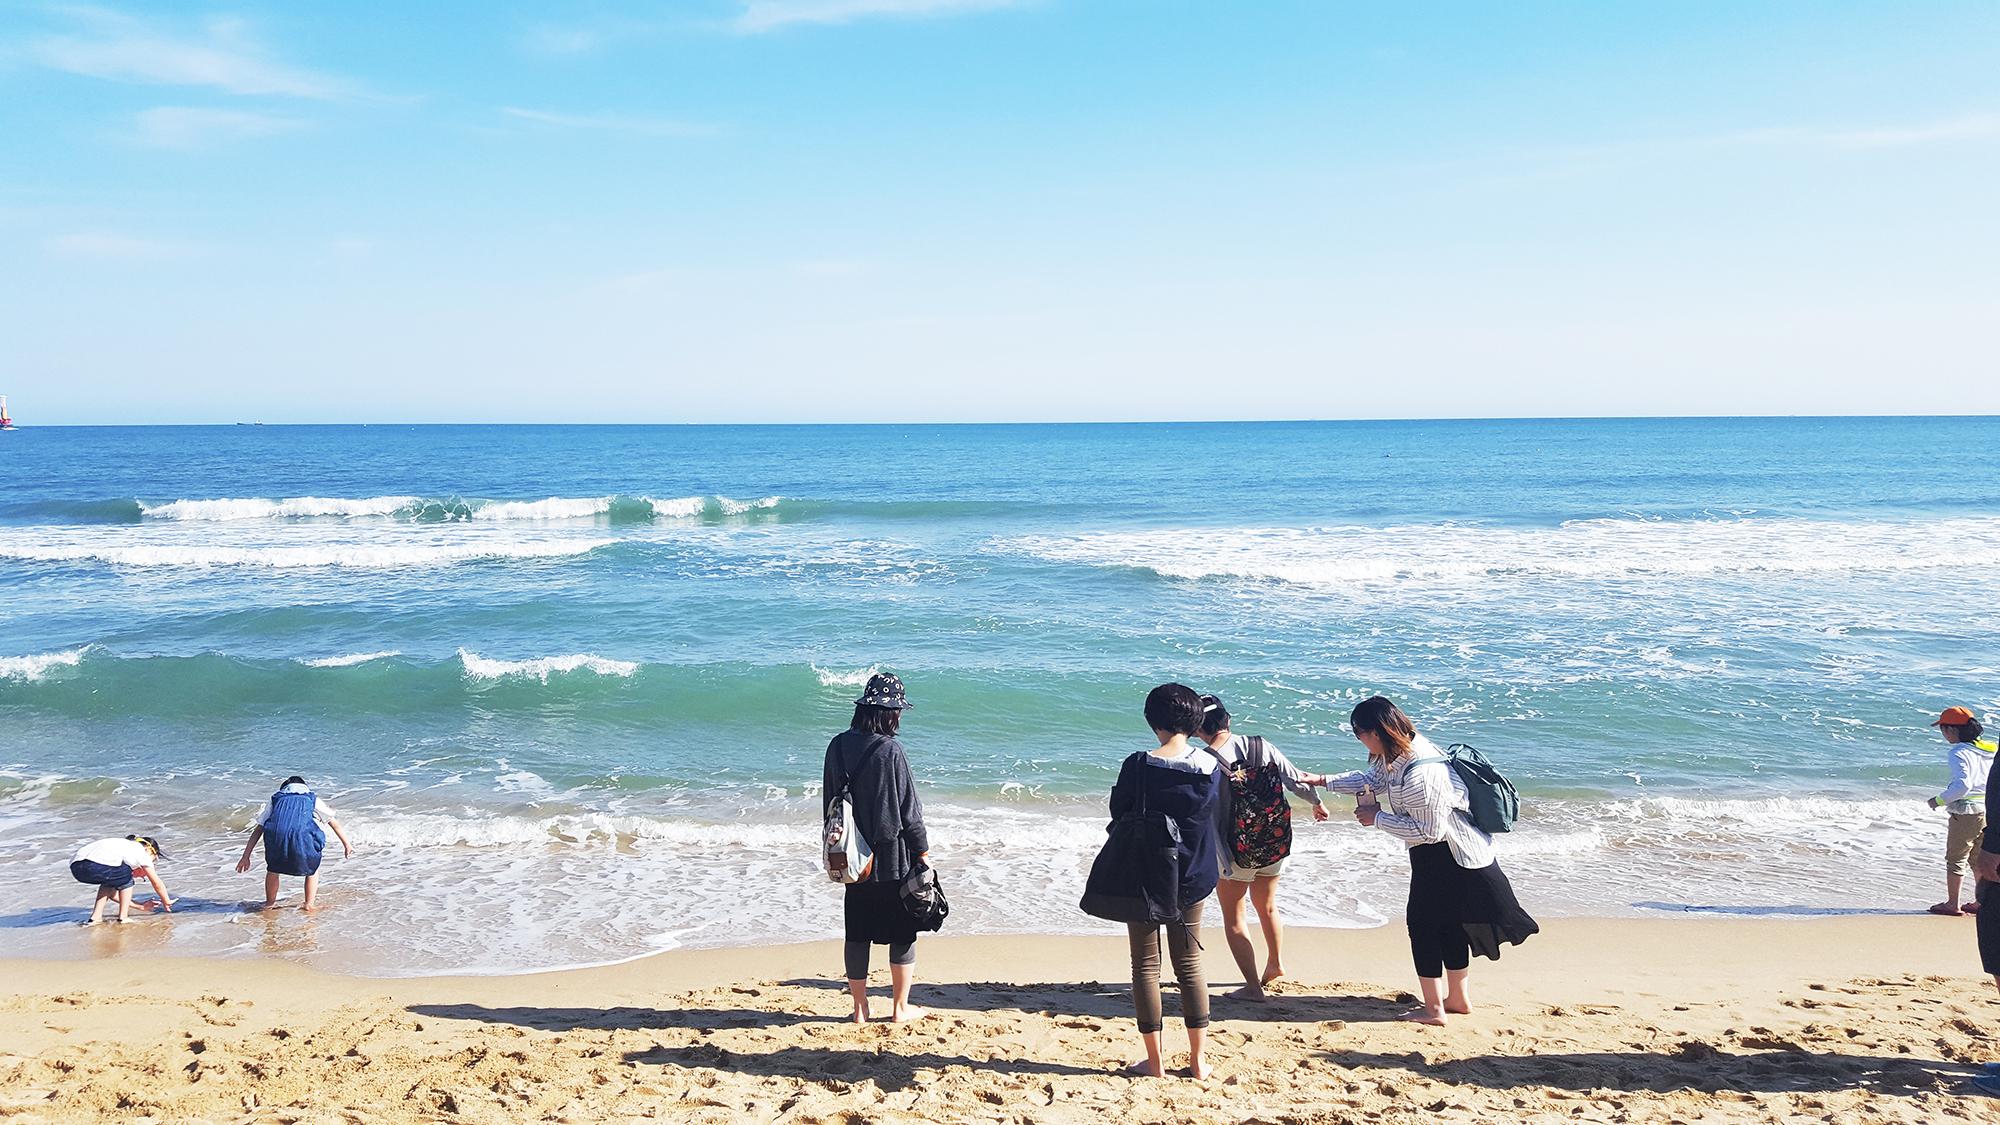 Haeunde beach busan - Autour de Marine